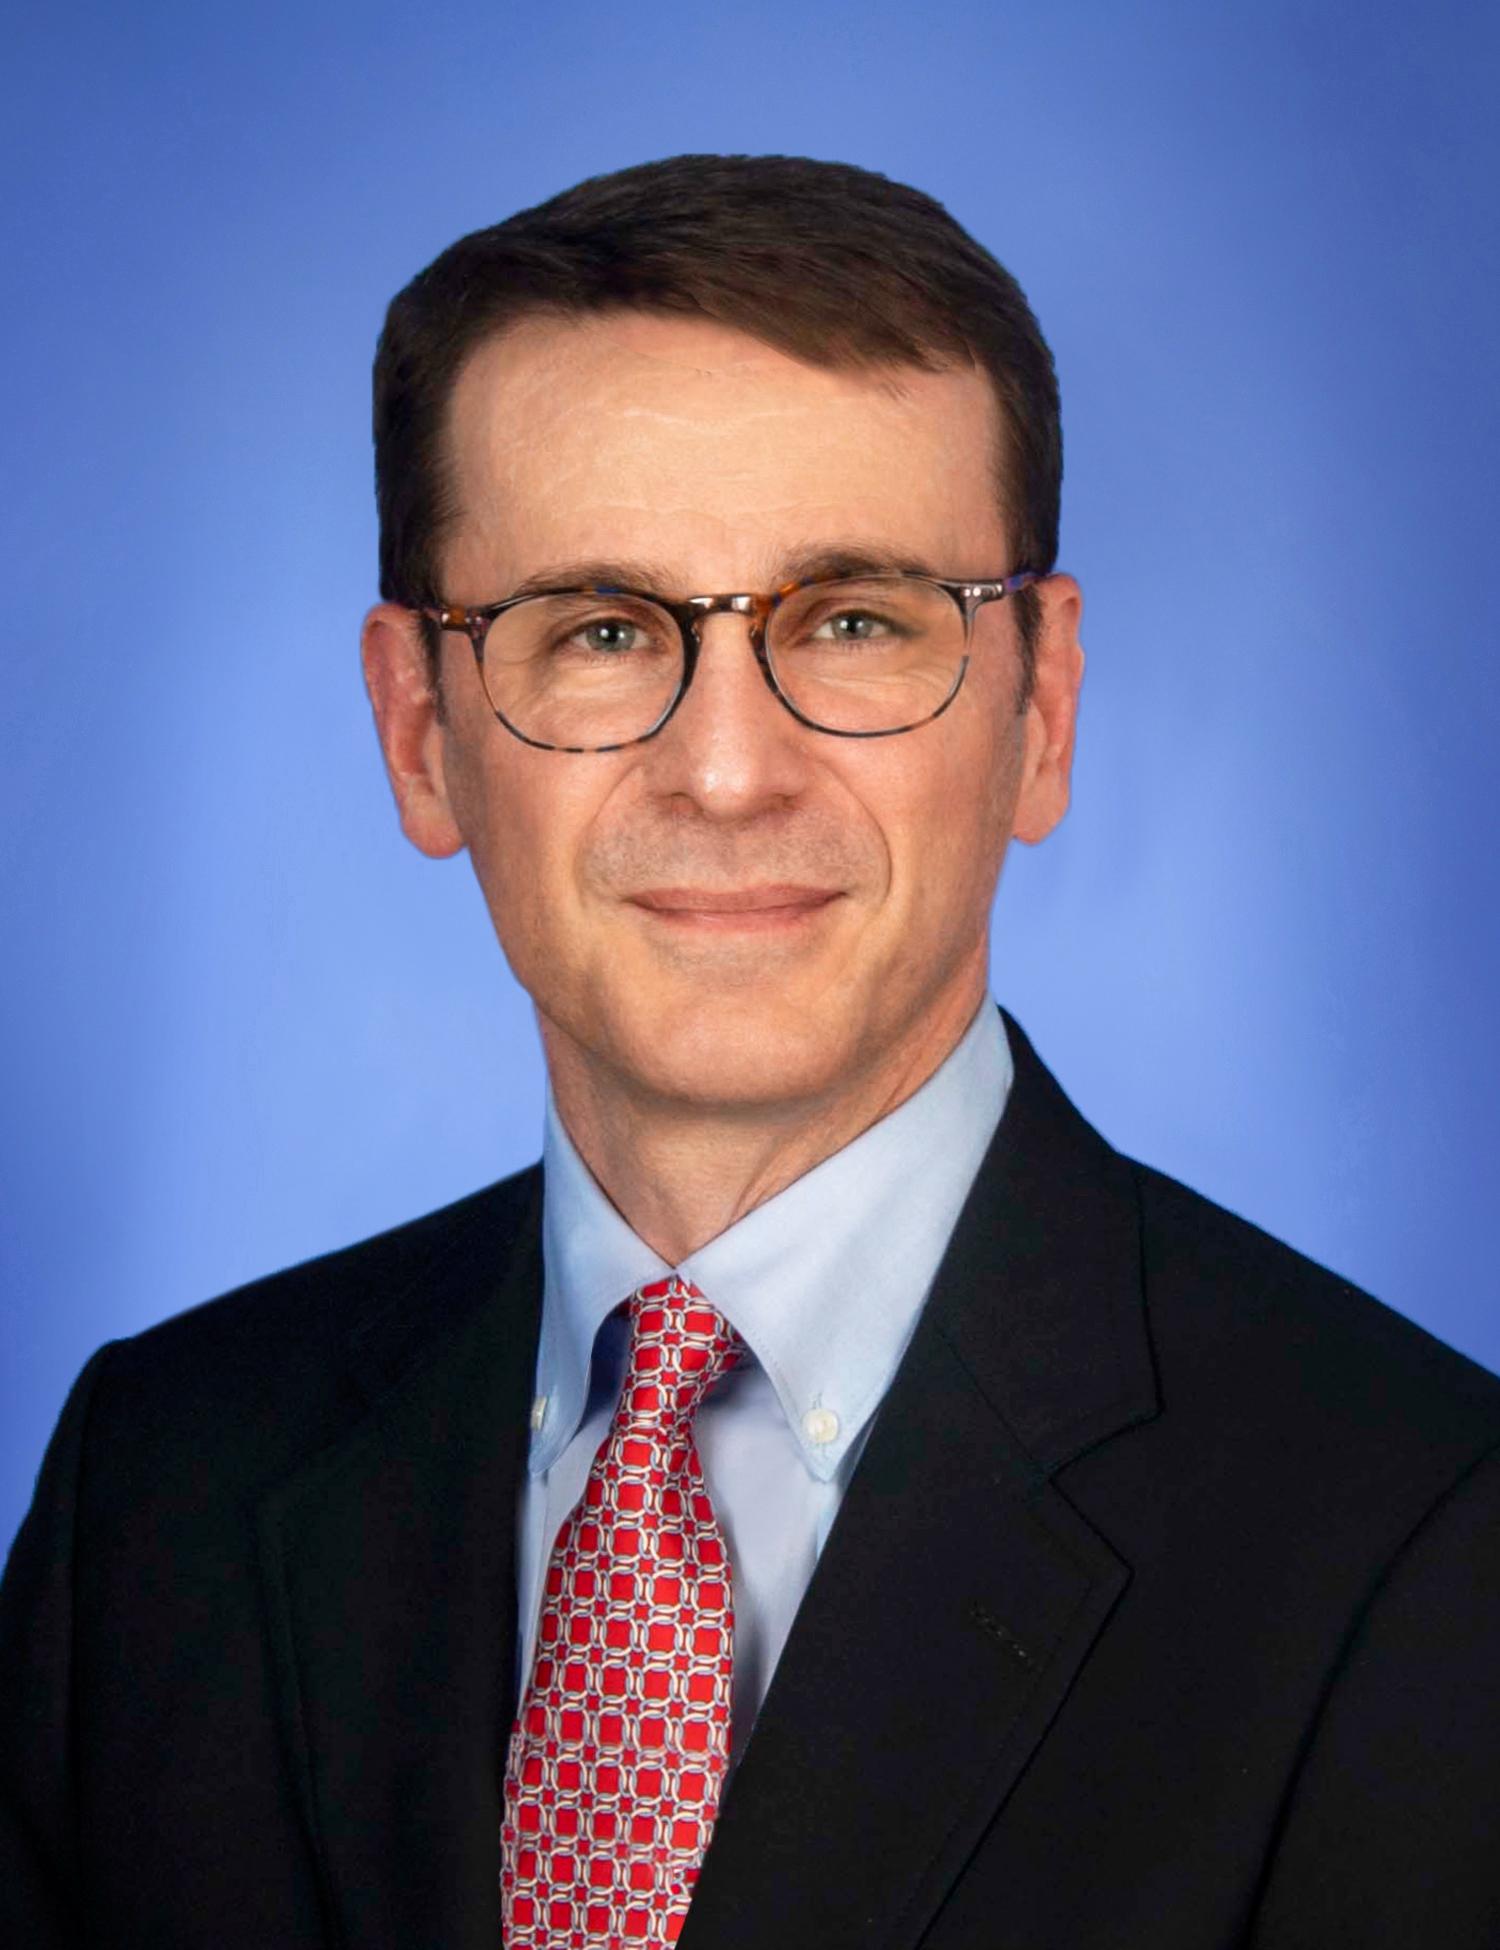 headshot of Mark Rogers